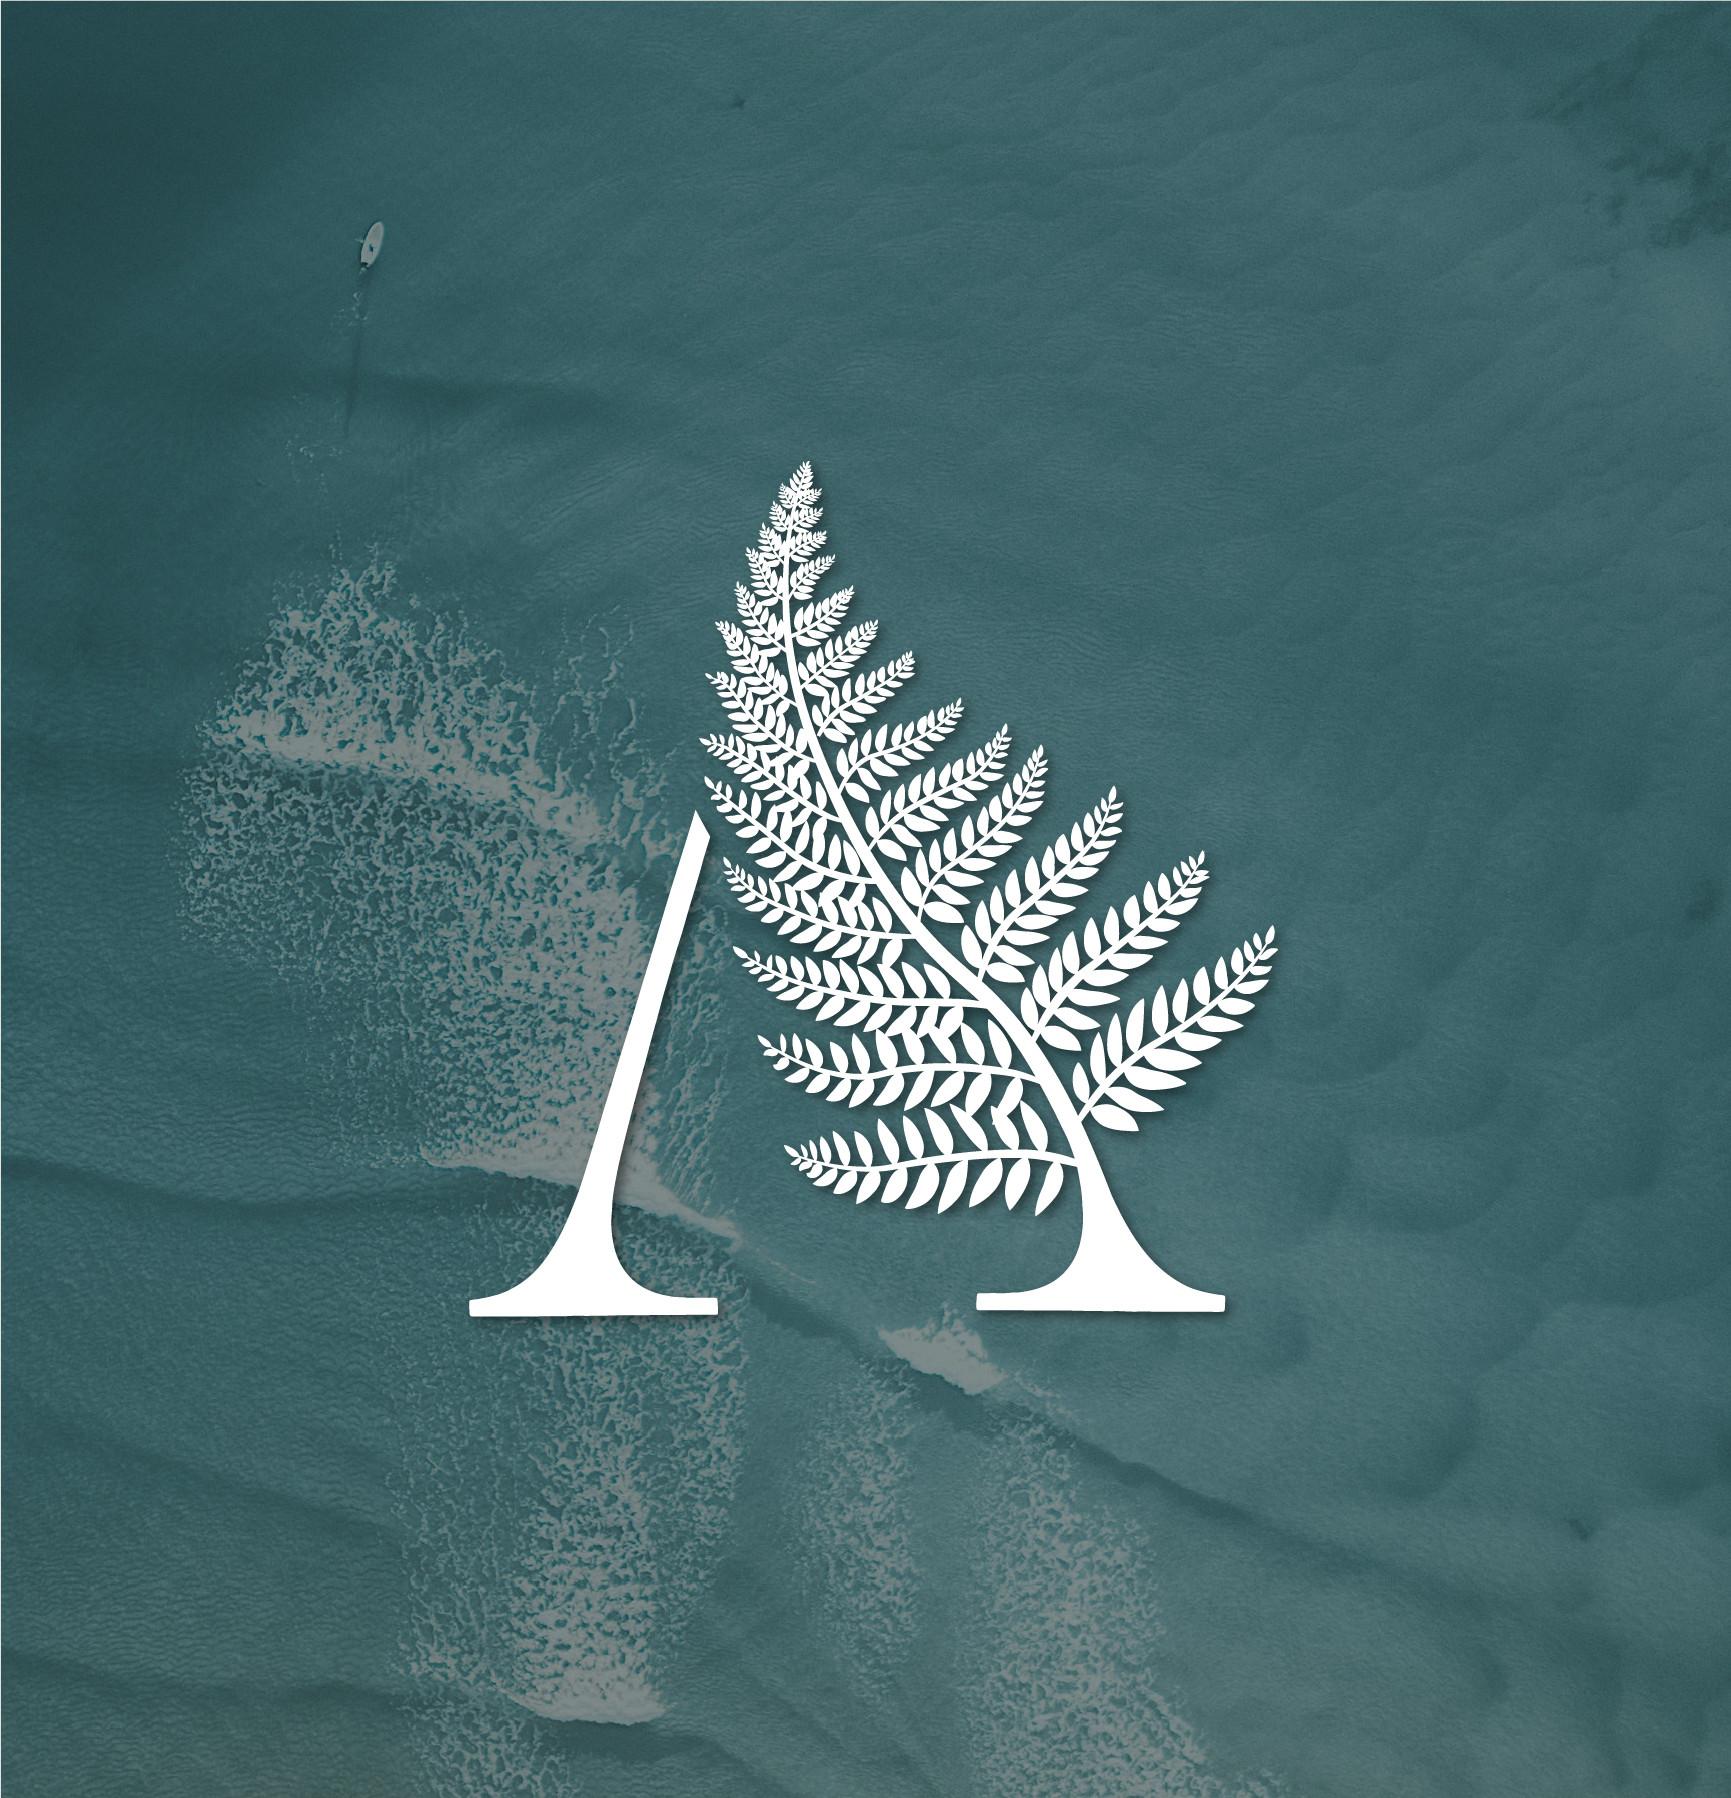 fern logo design with water background